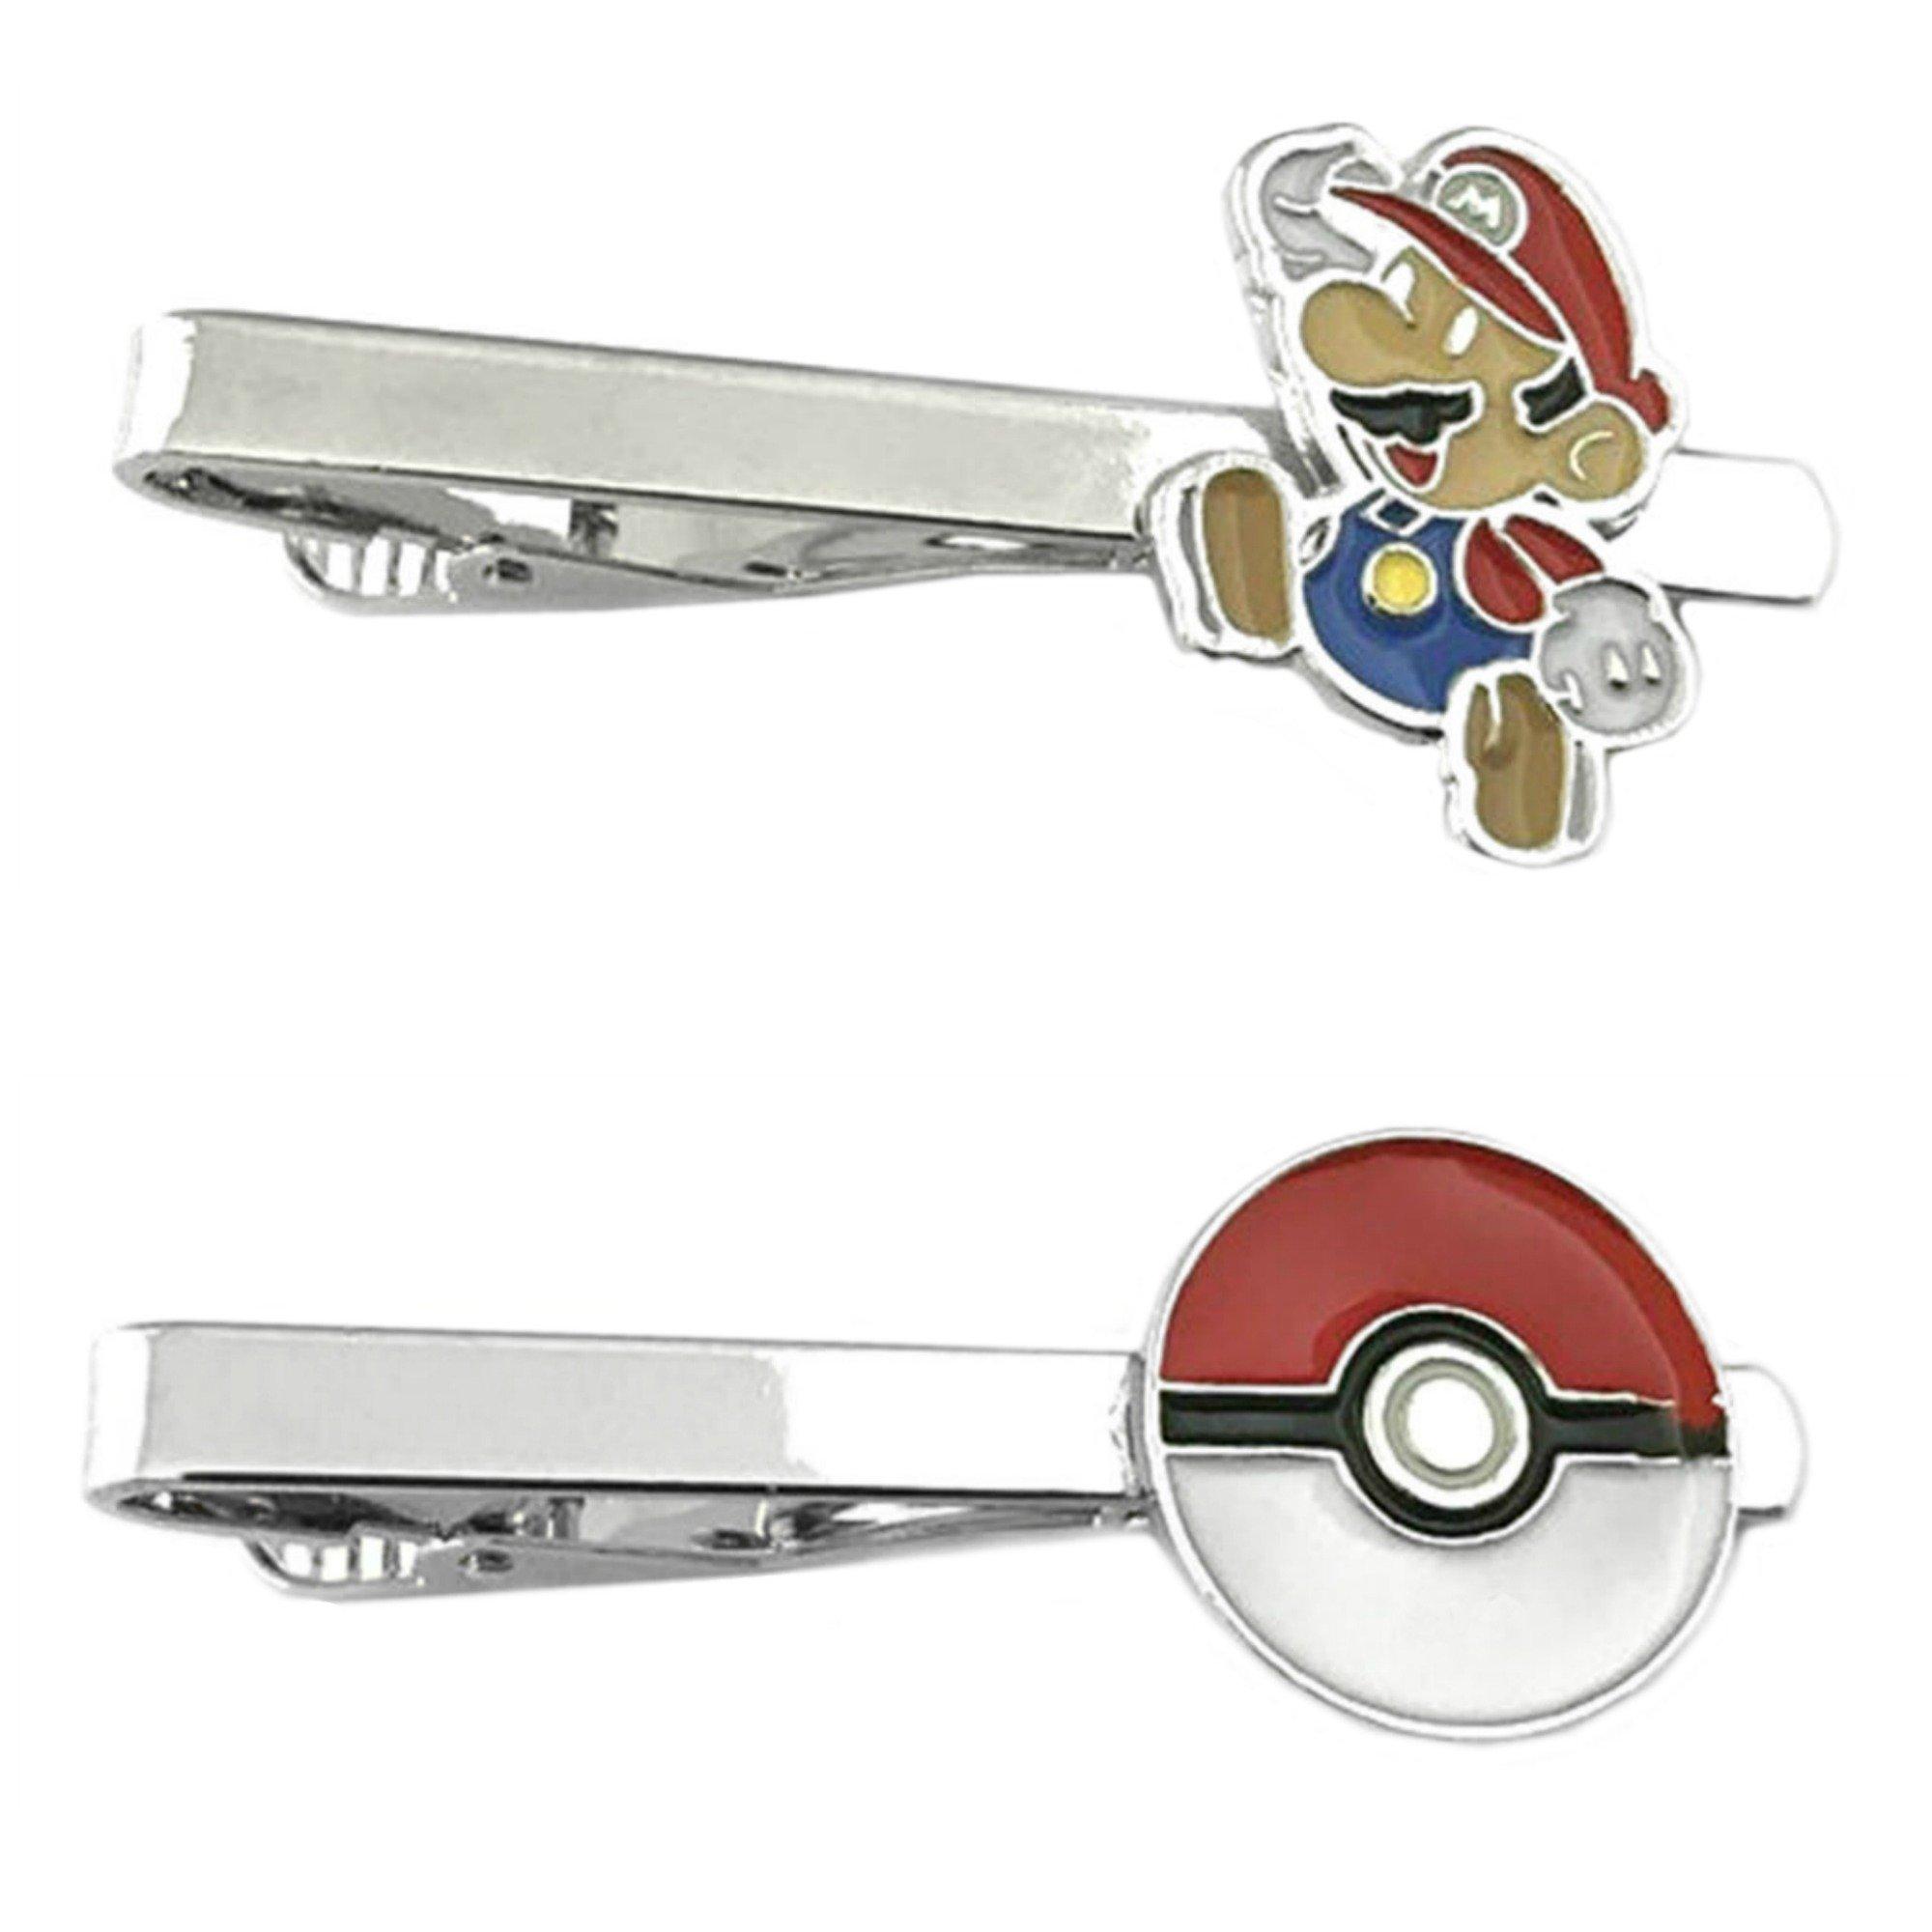 Outlander Video Games - Super Mario Jump & PokeMon PokeBall - Tiebar Tie Clasp Set of 2 Wedding Superhero Logo w/Gift Box